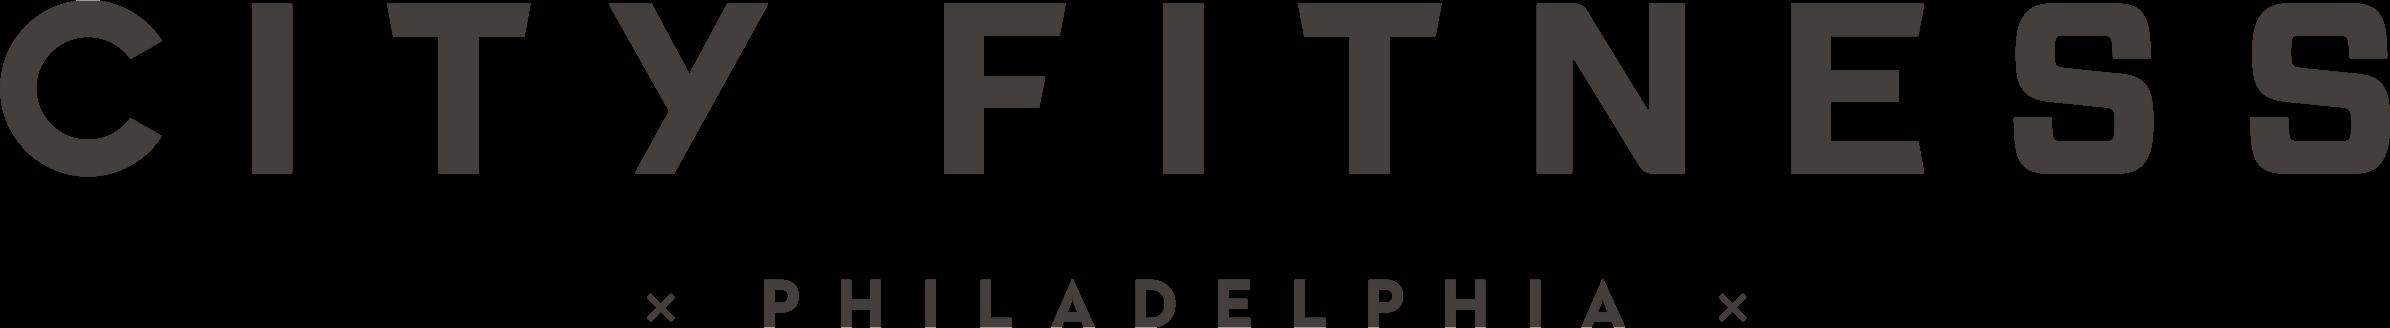 City Fitness Logo